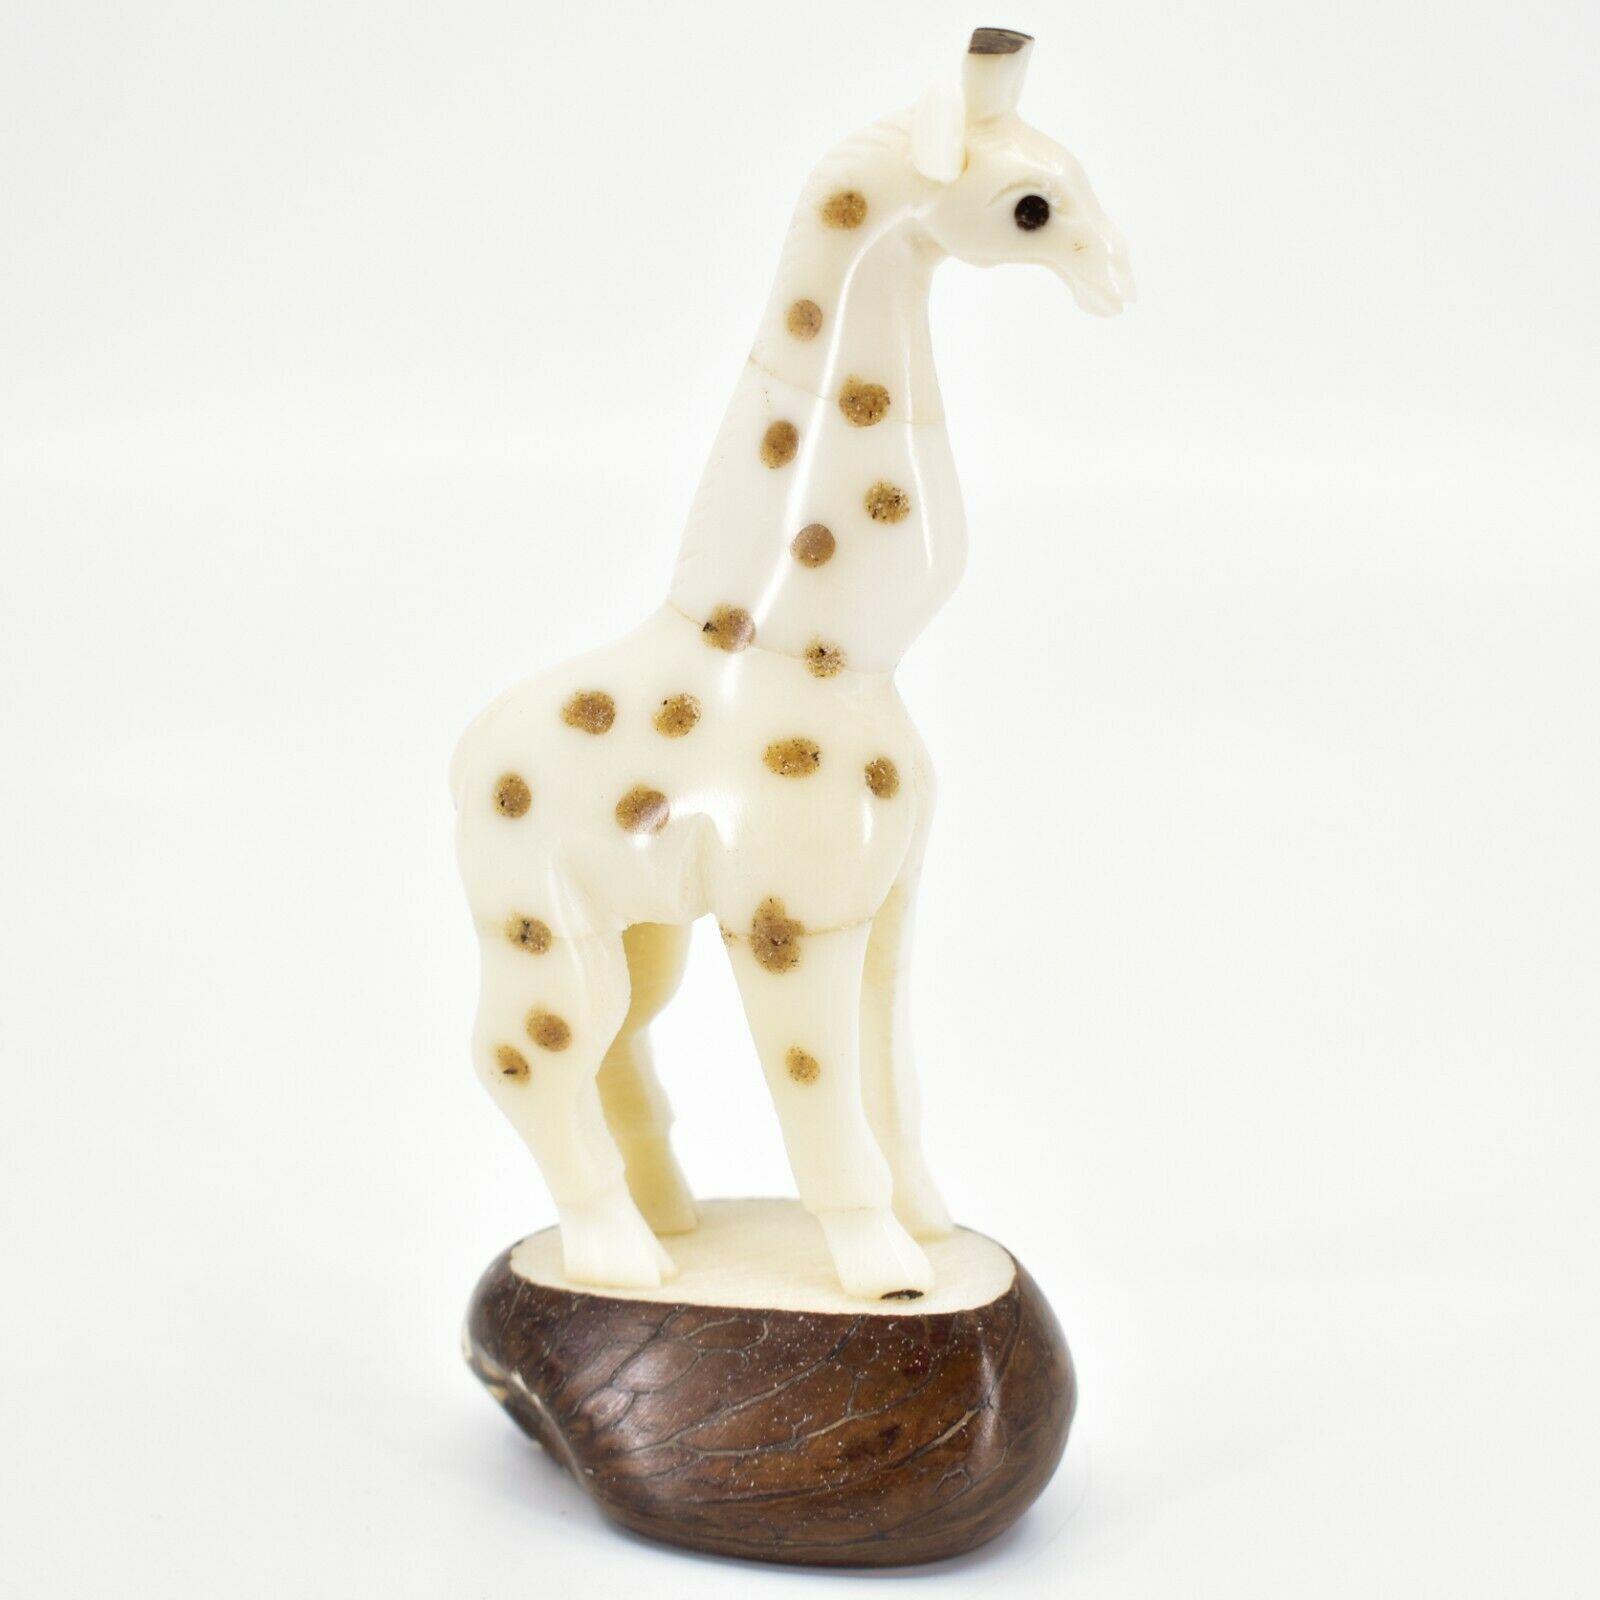 "Hand Carved Tagua Nut Carving Giraffe 5.5"" Figurine Handmade in Ecuador"